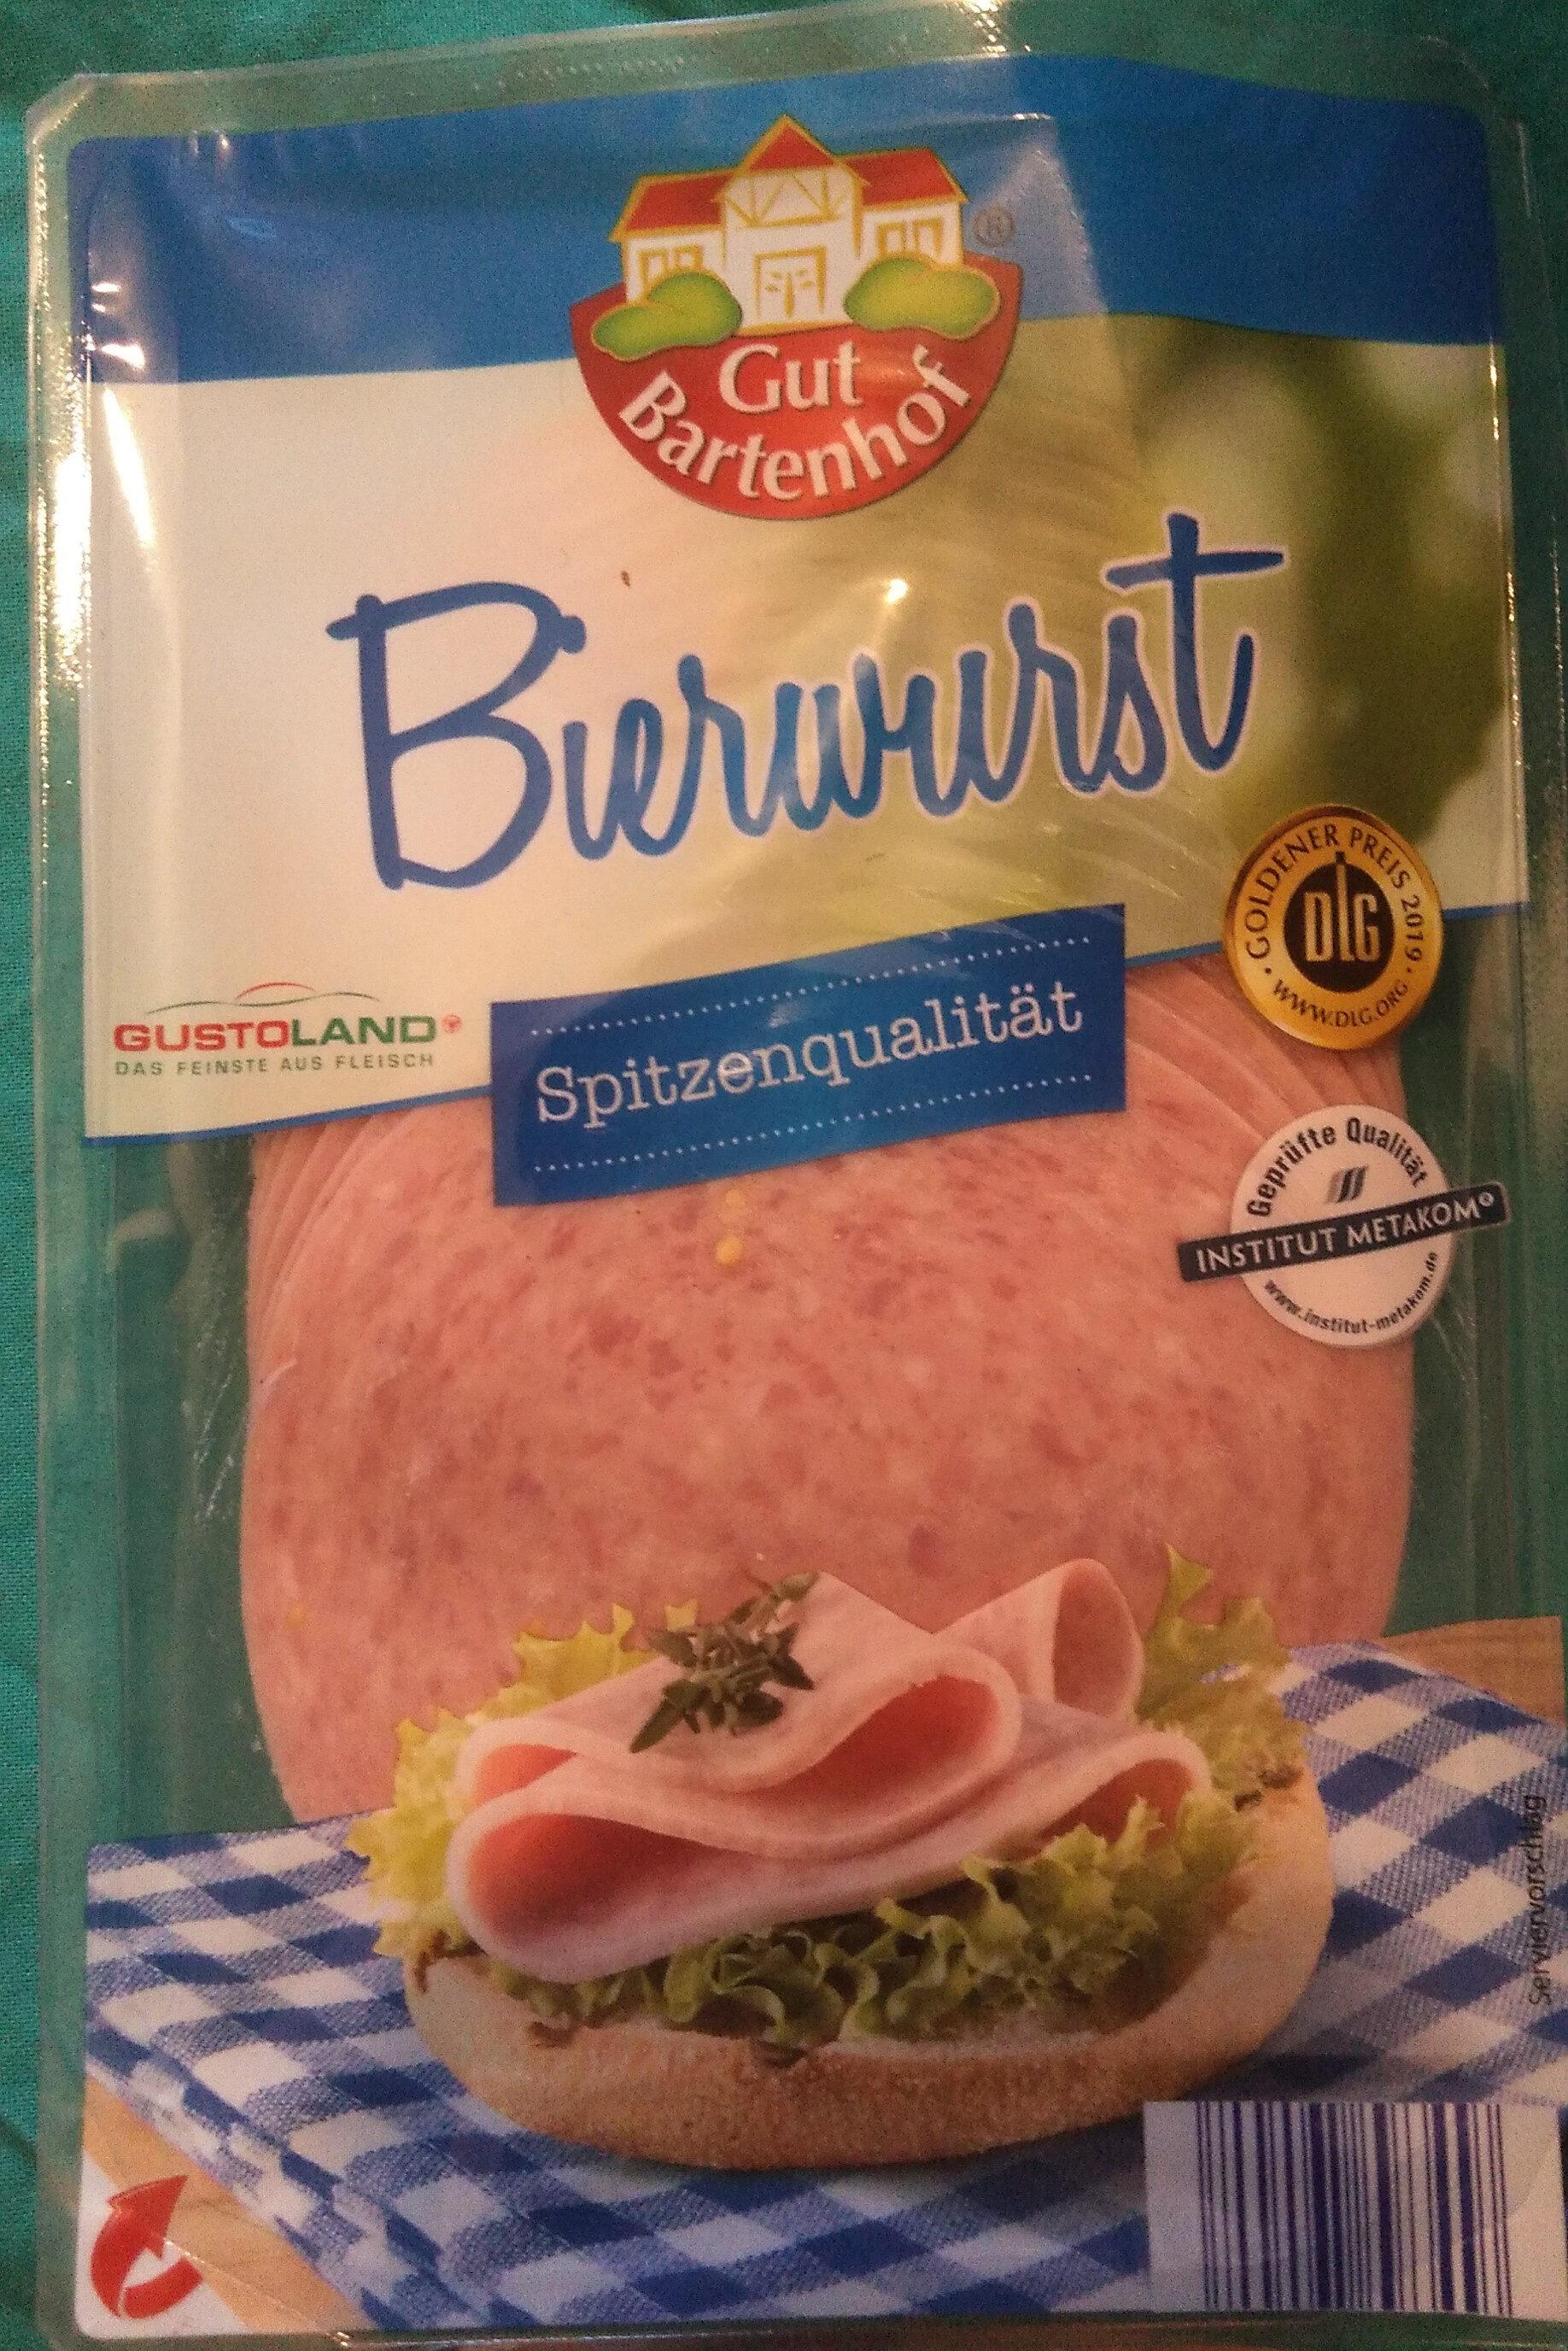 Bierwurst - Product